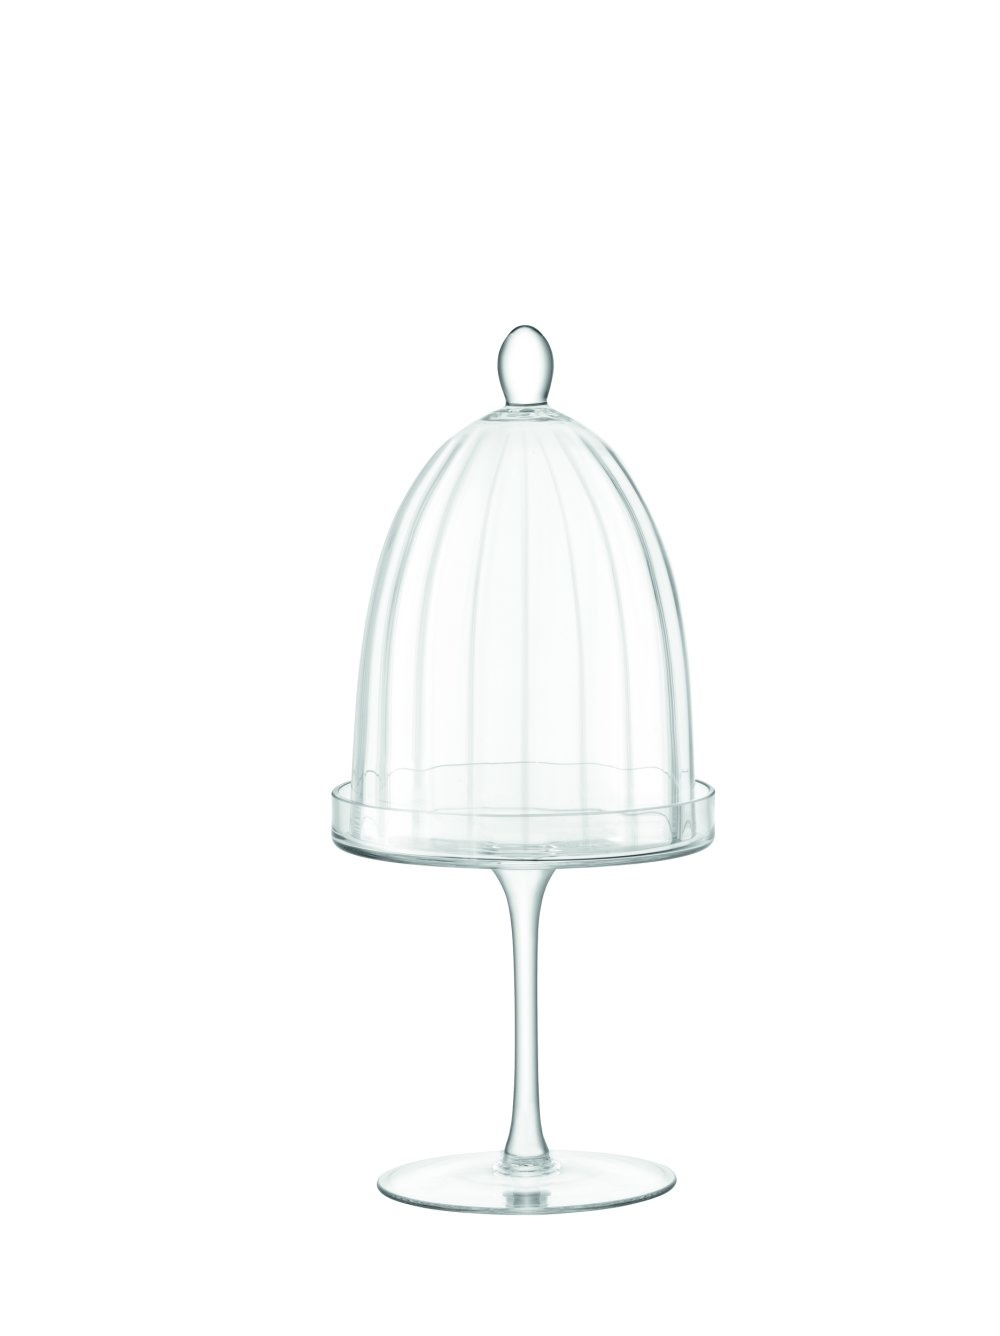 L.S.A. Aurelia Stand & Dome Ø 14.5 cm